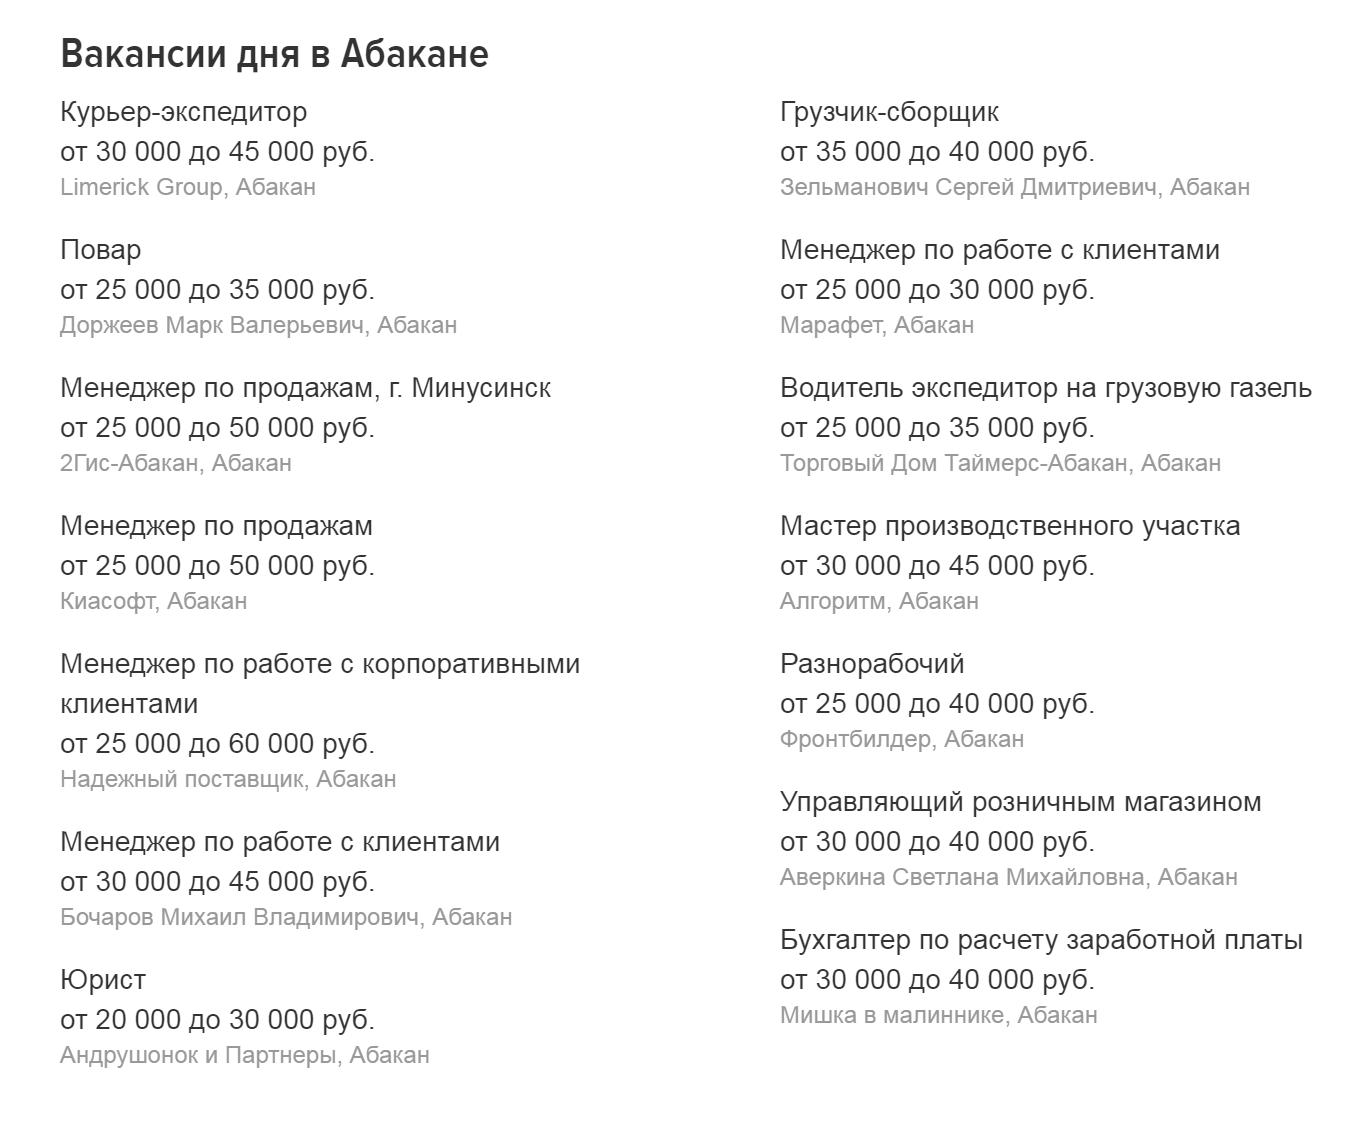 Минимальную зарплату в&nbsp;Абакане «Хедхантер» предлагает уборщице — 15&nbsp;000&nbsp;<span class=ruble>Р</span>